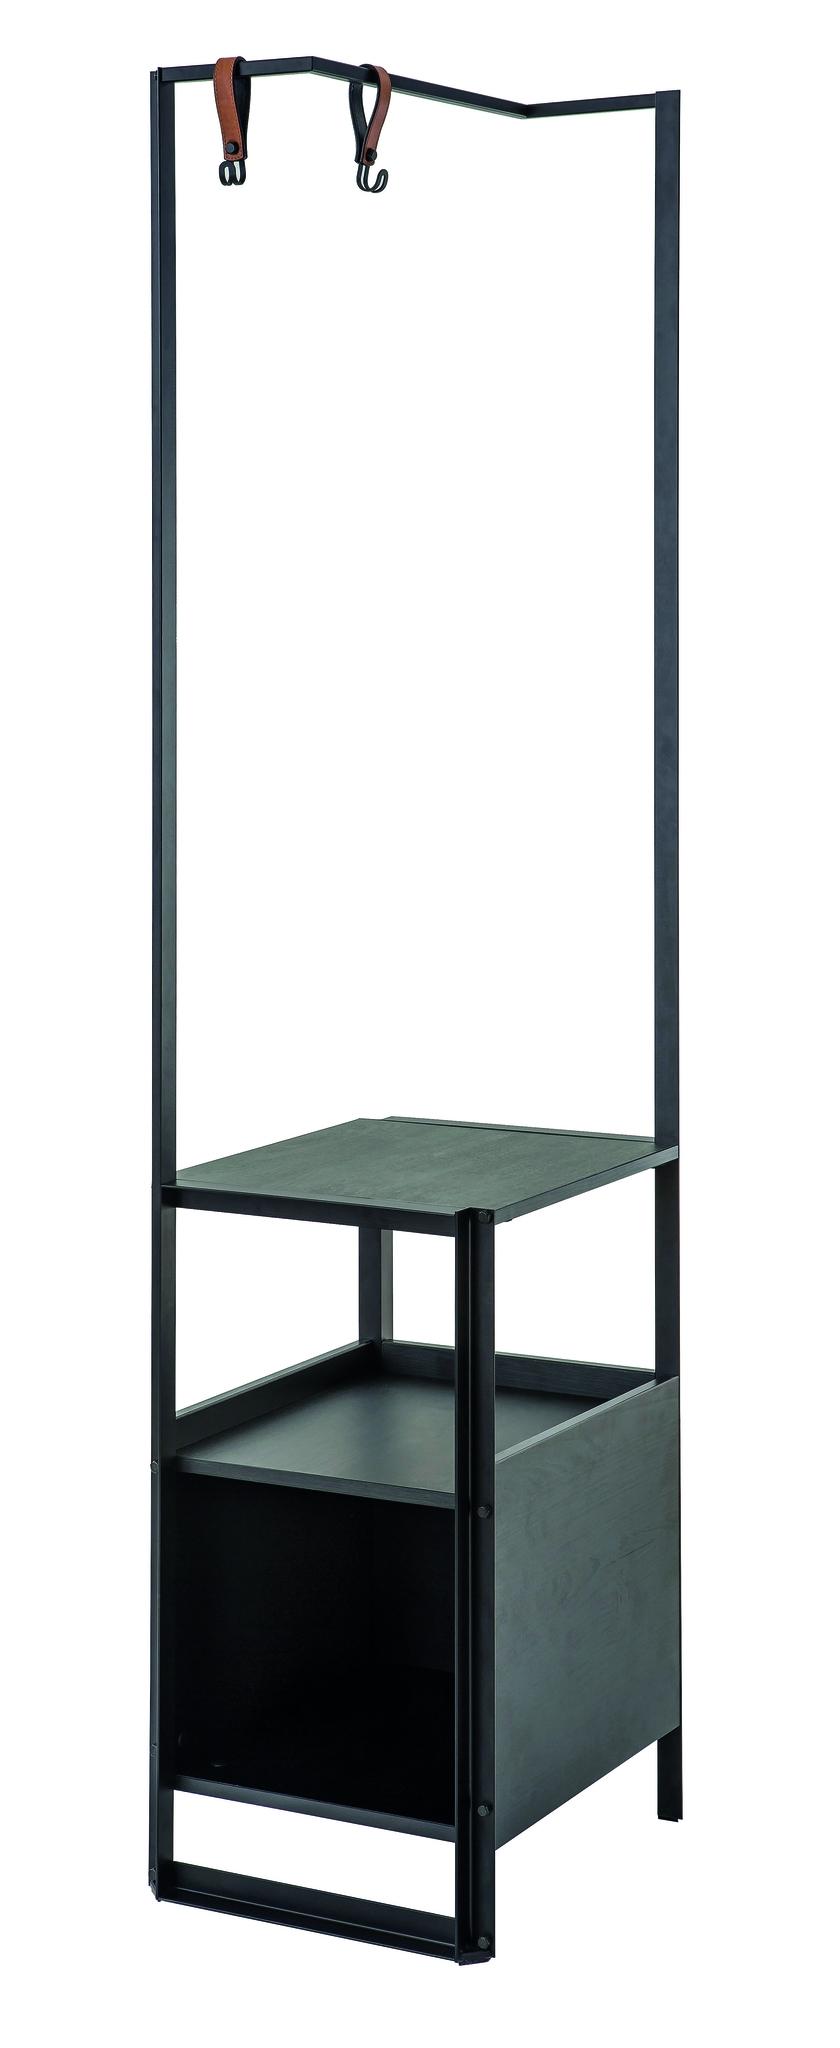 Raft cu suport umerase din pal si metal, pentru tineret Dark Metal Black / Graphite, l40xA48xH187 cm